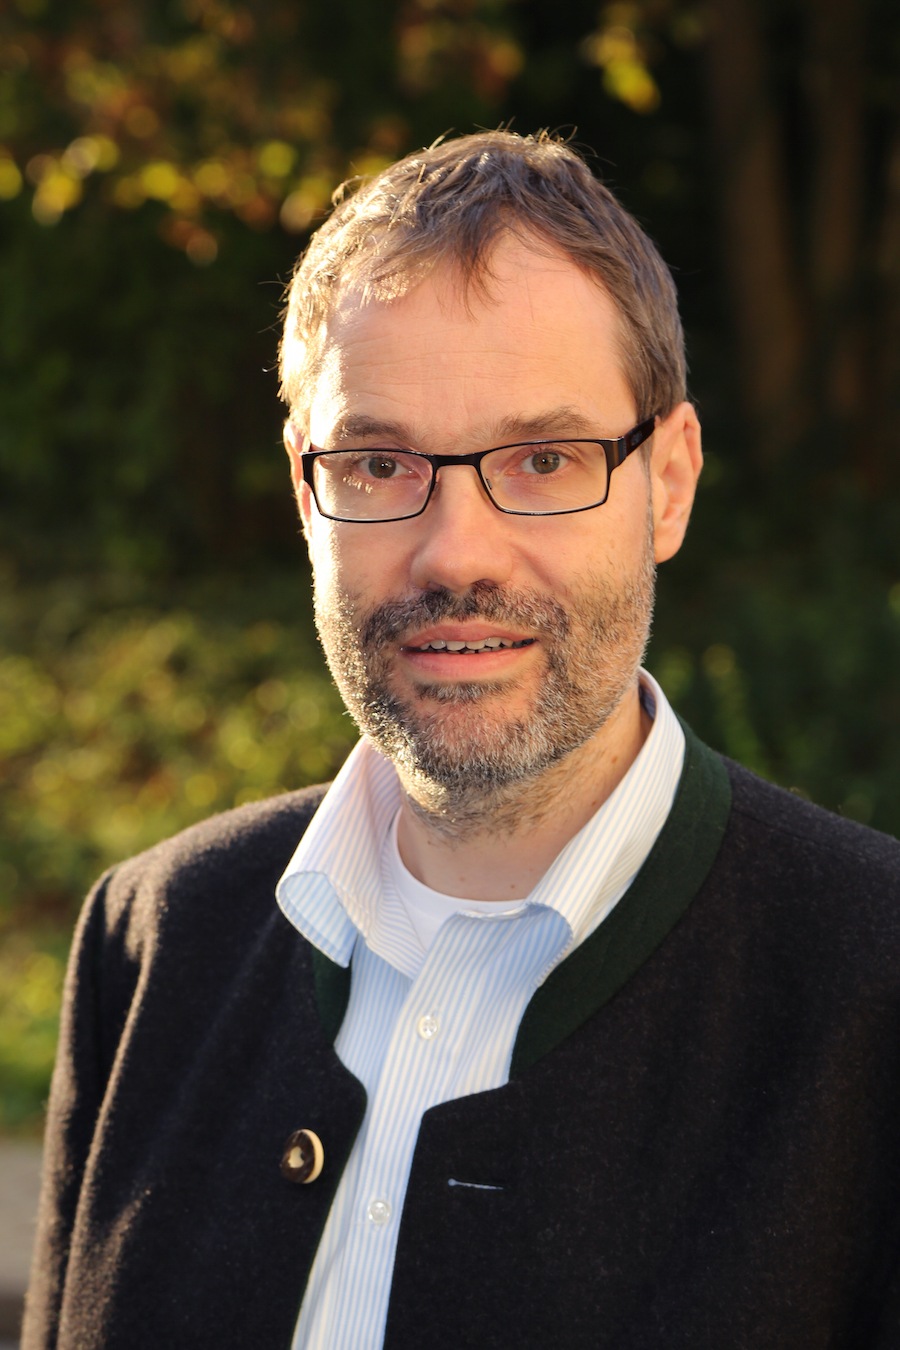 Foto: Privat /Dr. Jörg Friedmann